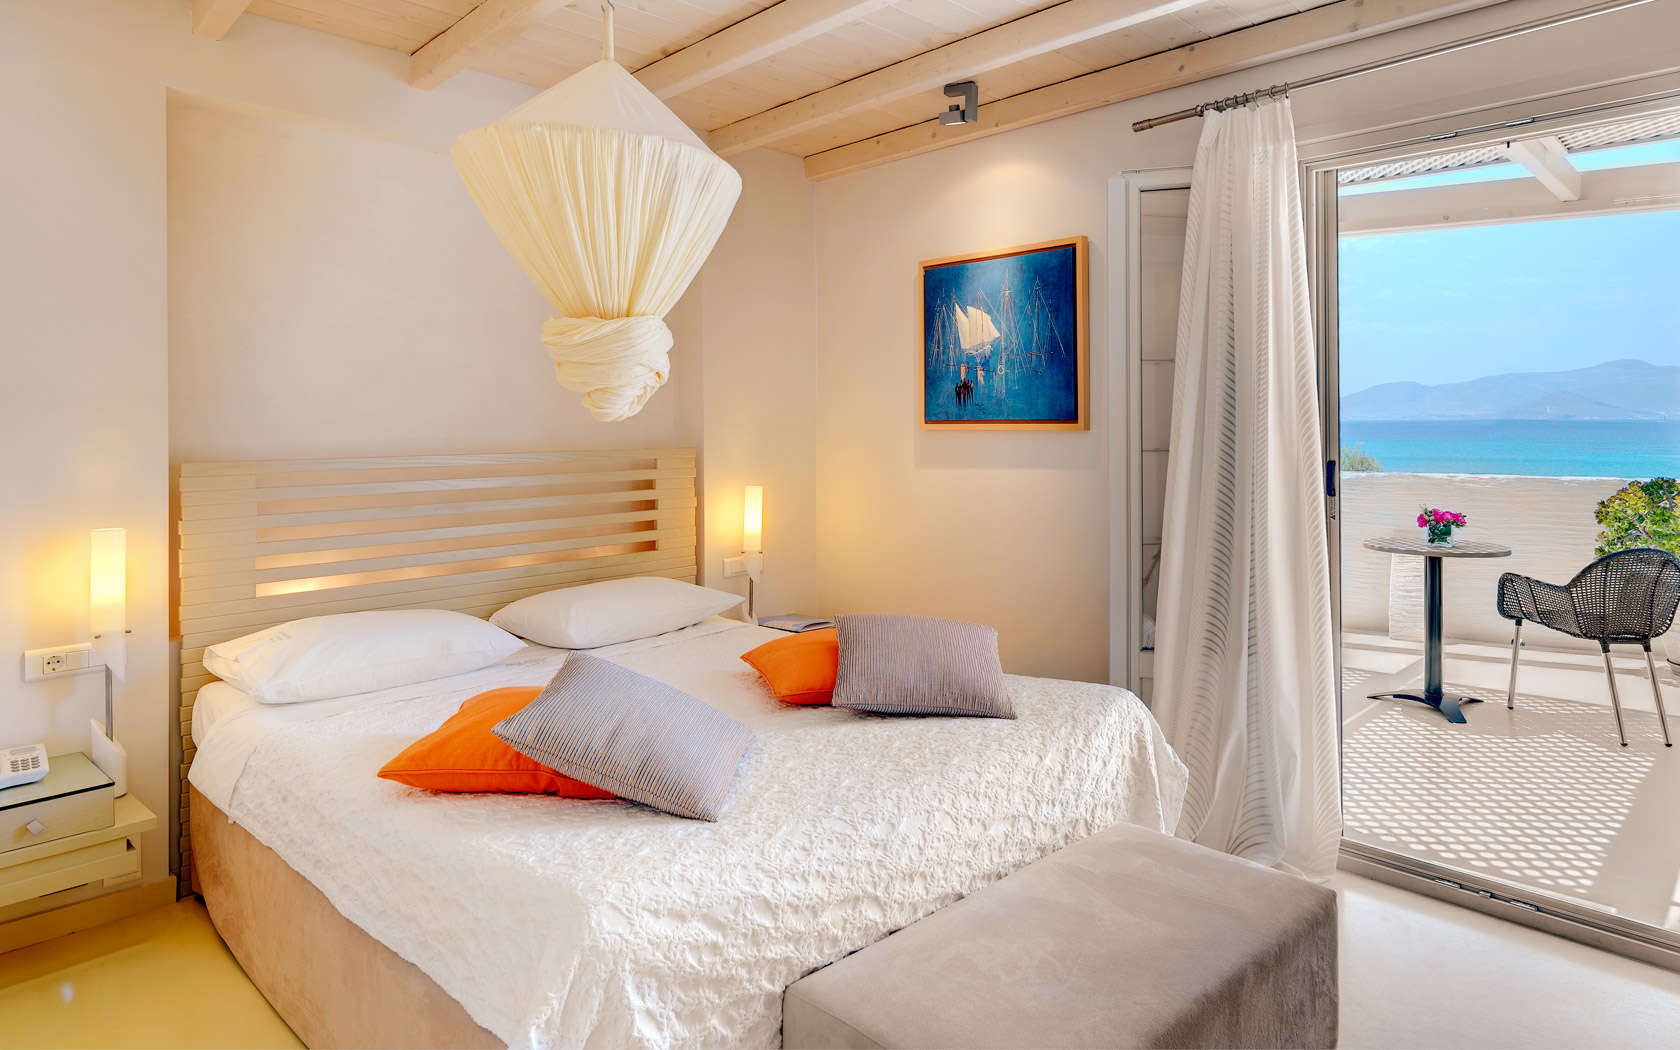 naxos-iriabeach-hotel